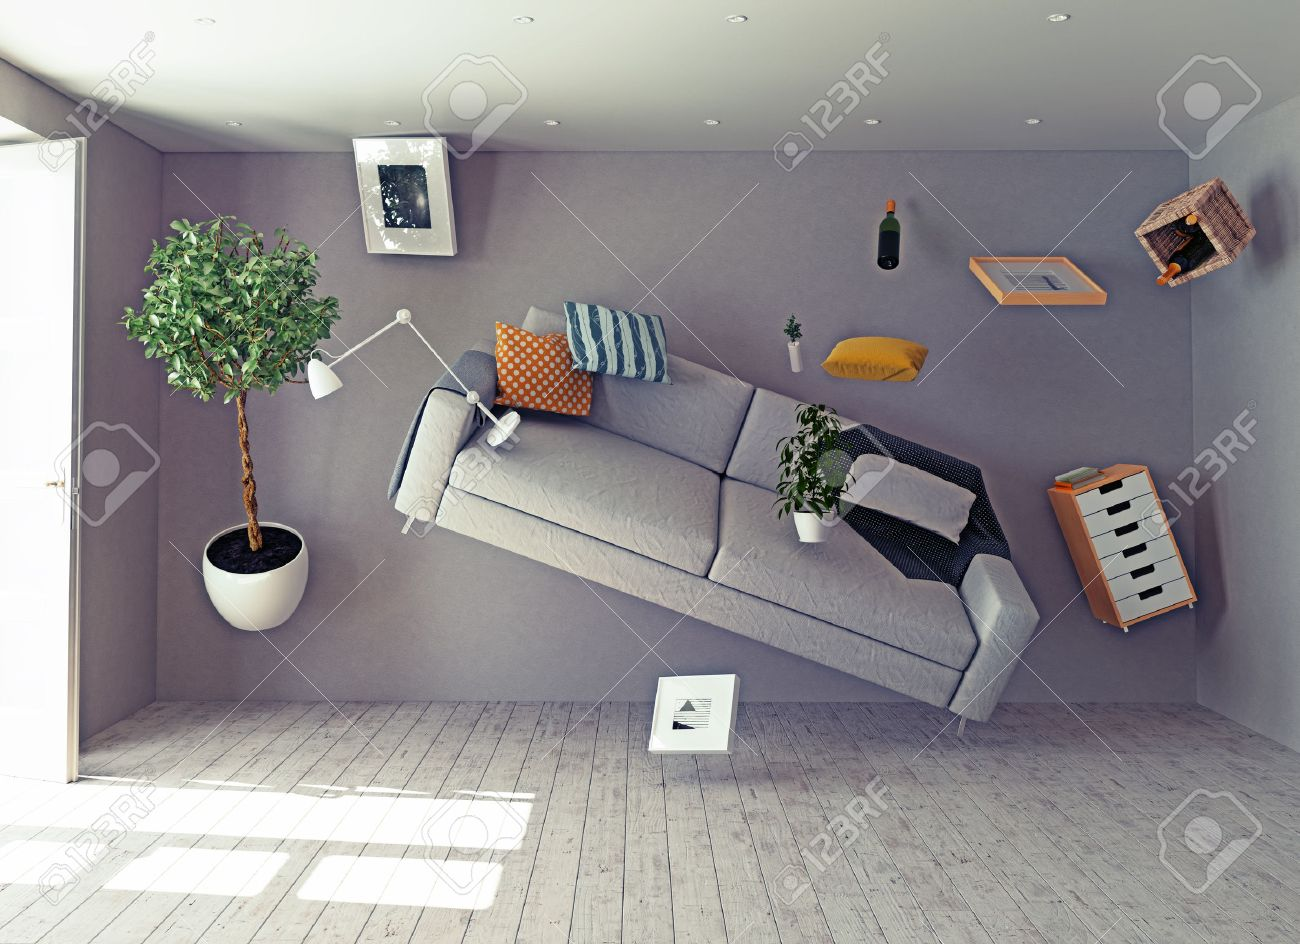 zero-gravity interior. 3d creative concept Stock Photo - 43295097